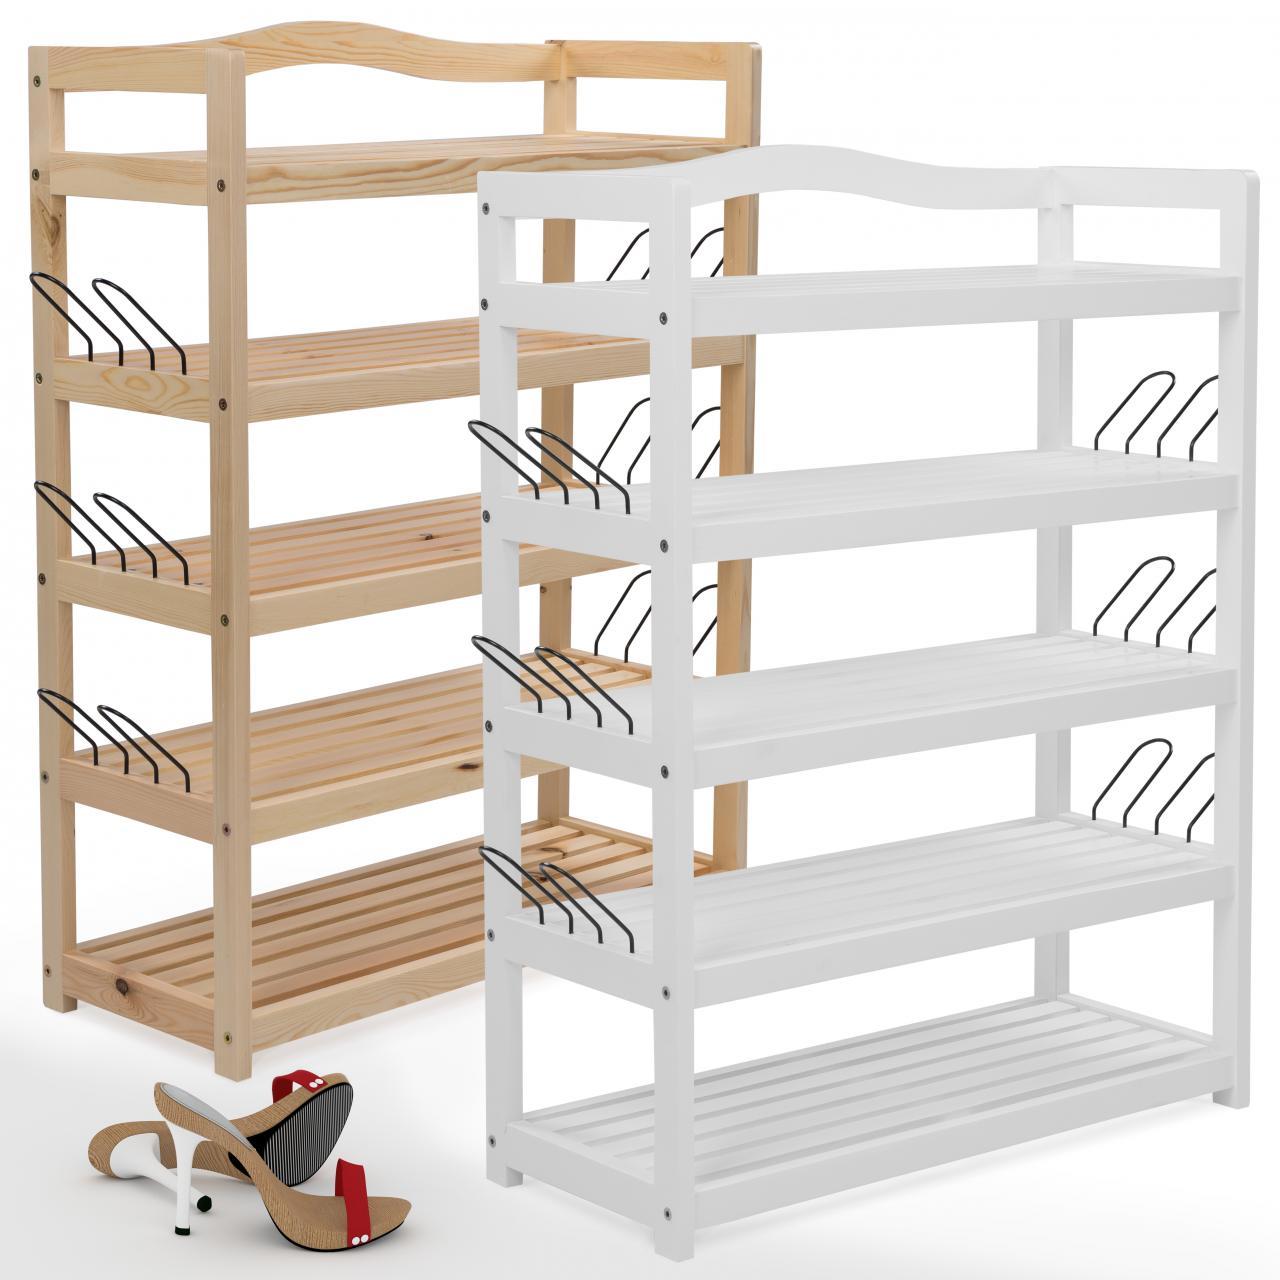 schuhregal schuhschrank schuhbank schuhst nder schuh regal. Black Bedroom Furniture Sets. Home Design Ideas